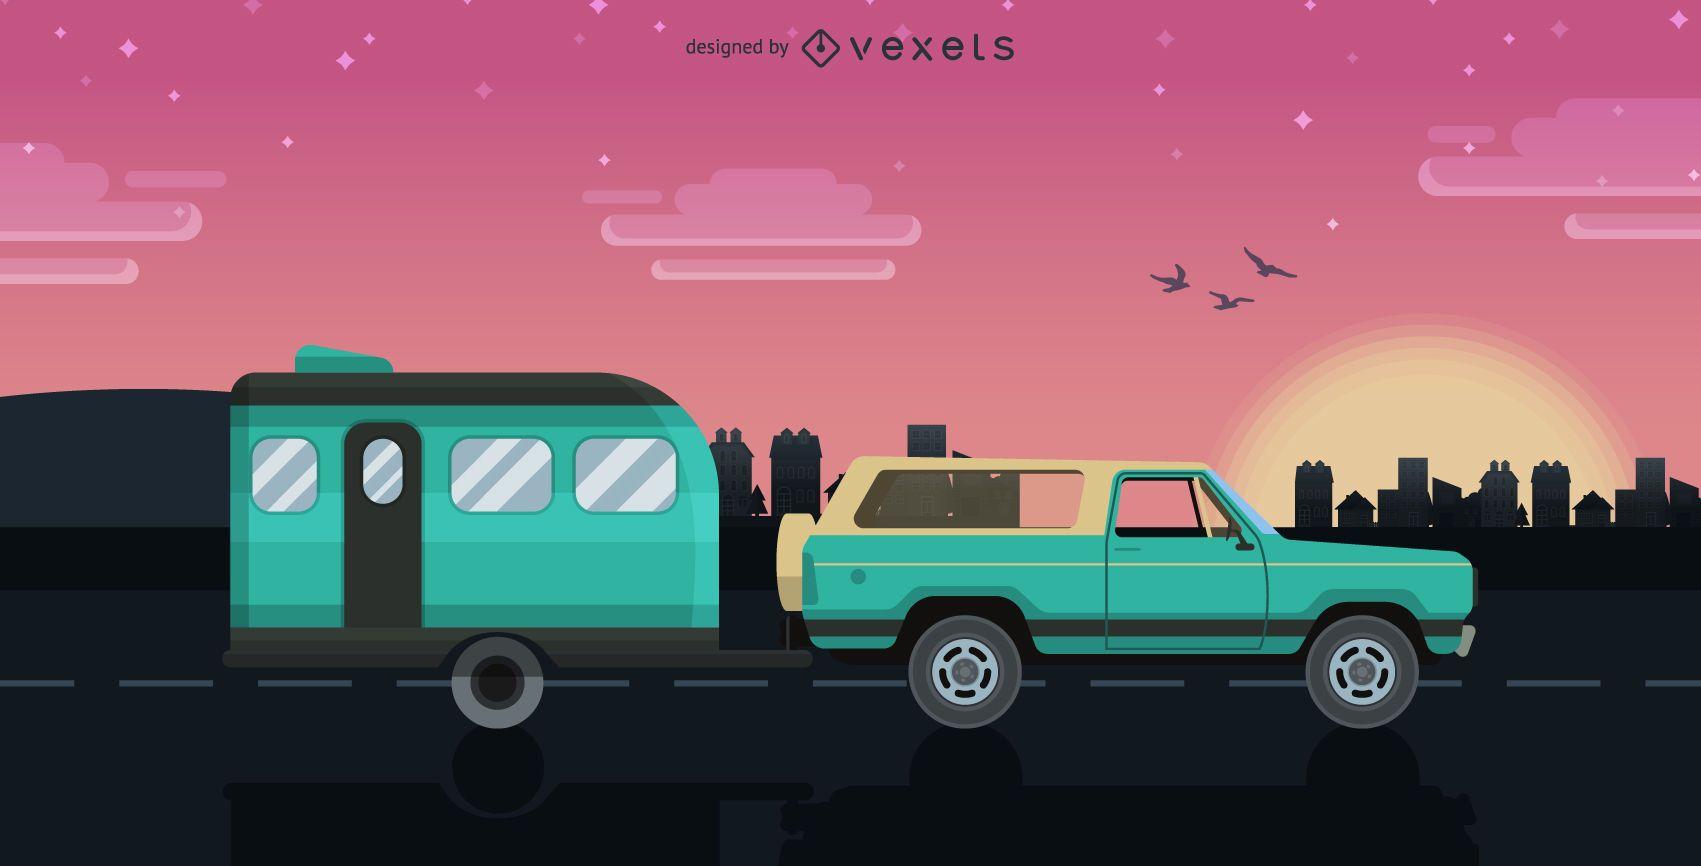 Caravan trip illustration